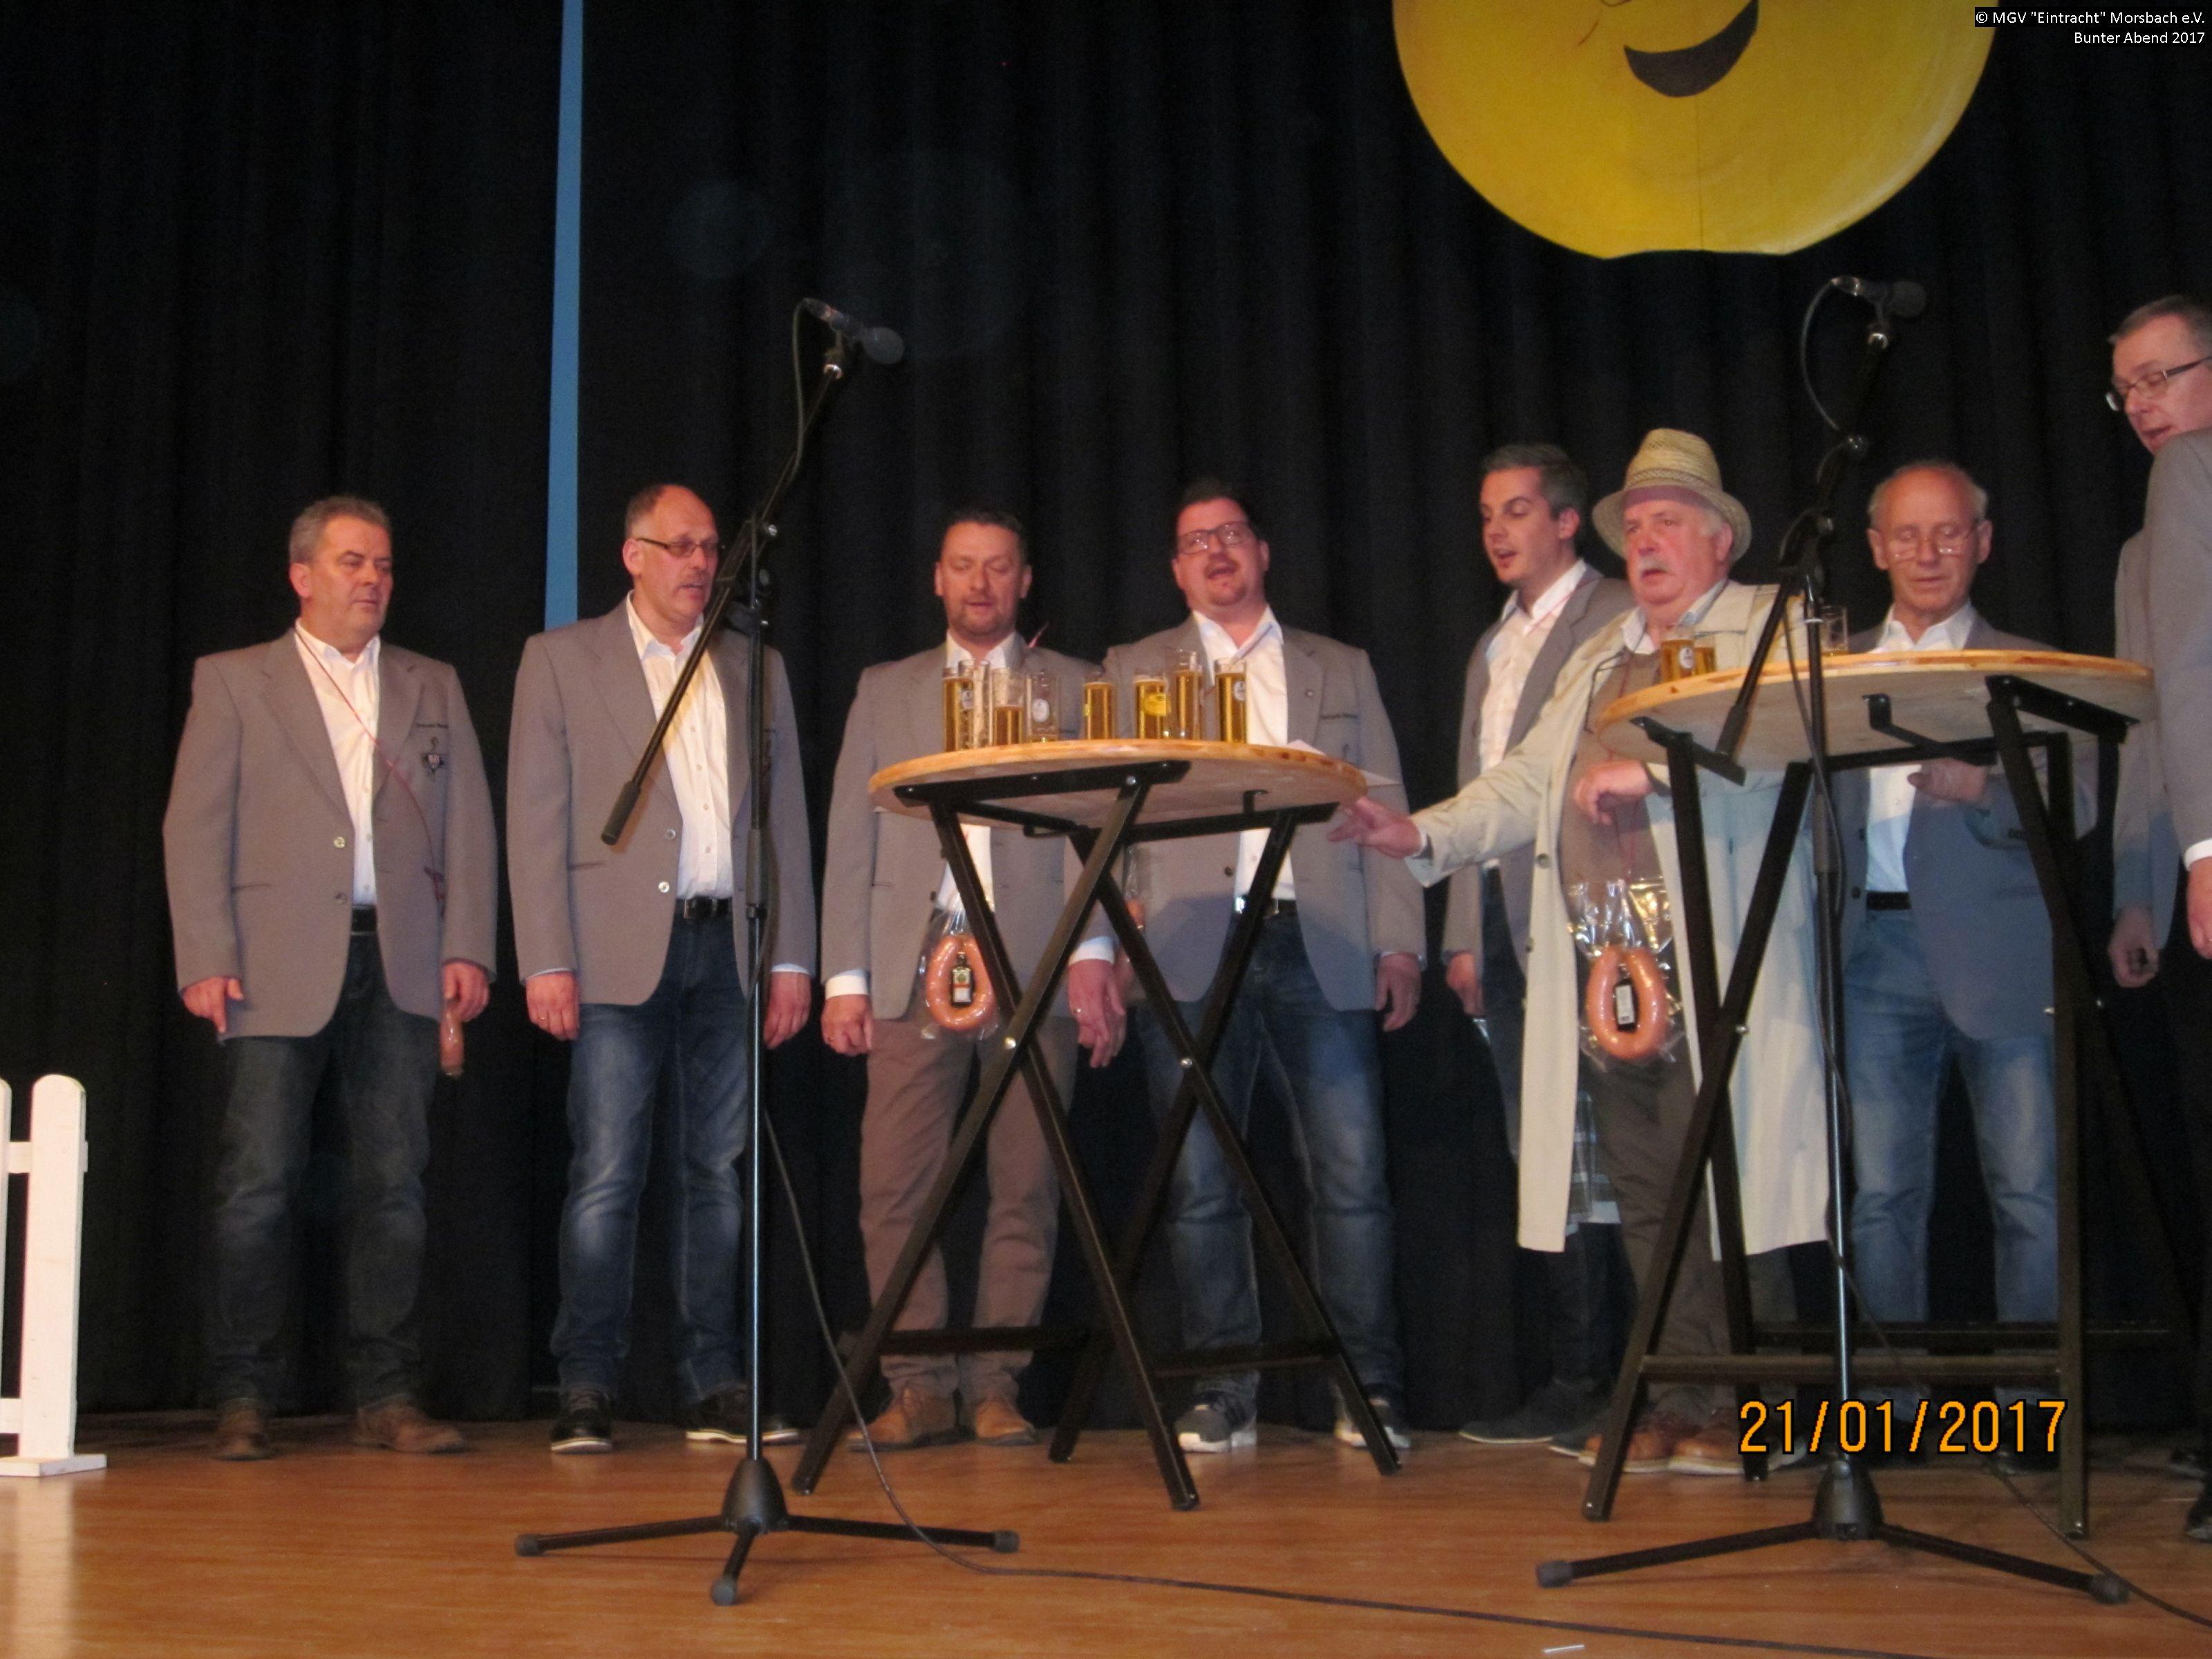 MGV_Eintracht_Morsbach_Bunter_Abend_2017_201